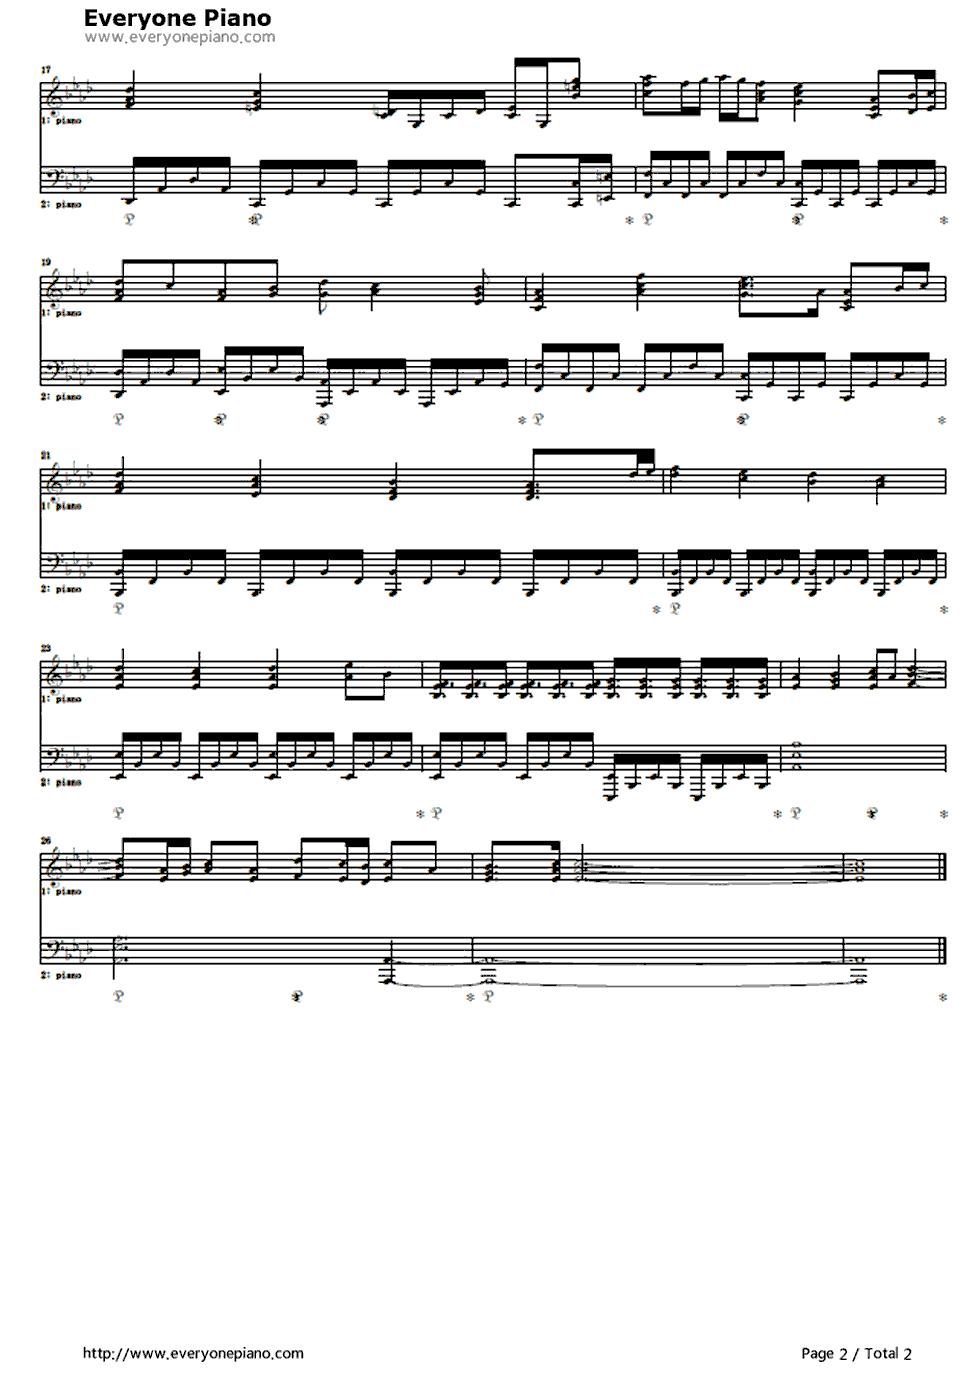 Decretumsayaka Theme Puella Magi Madoka Magica Piano Sheet